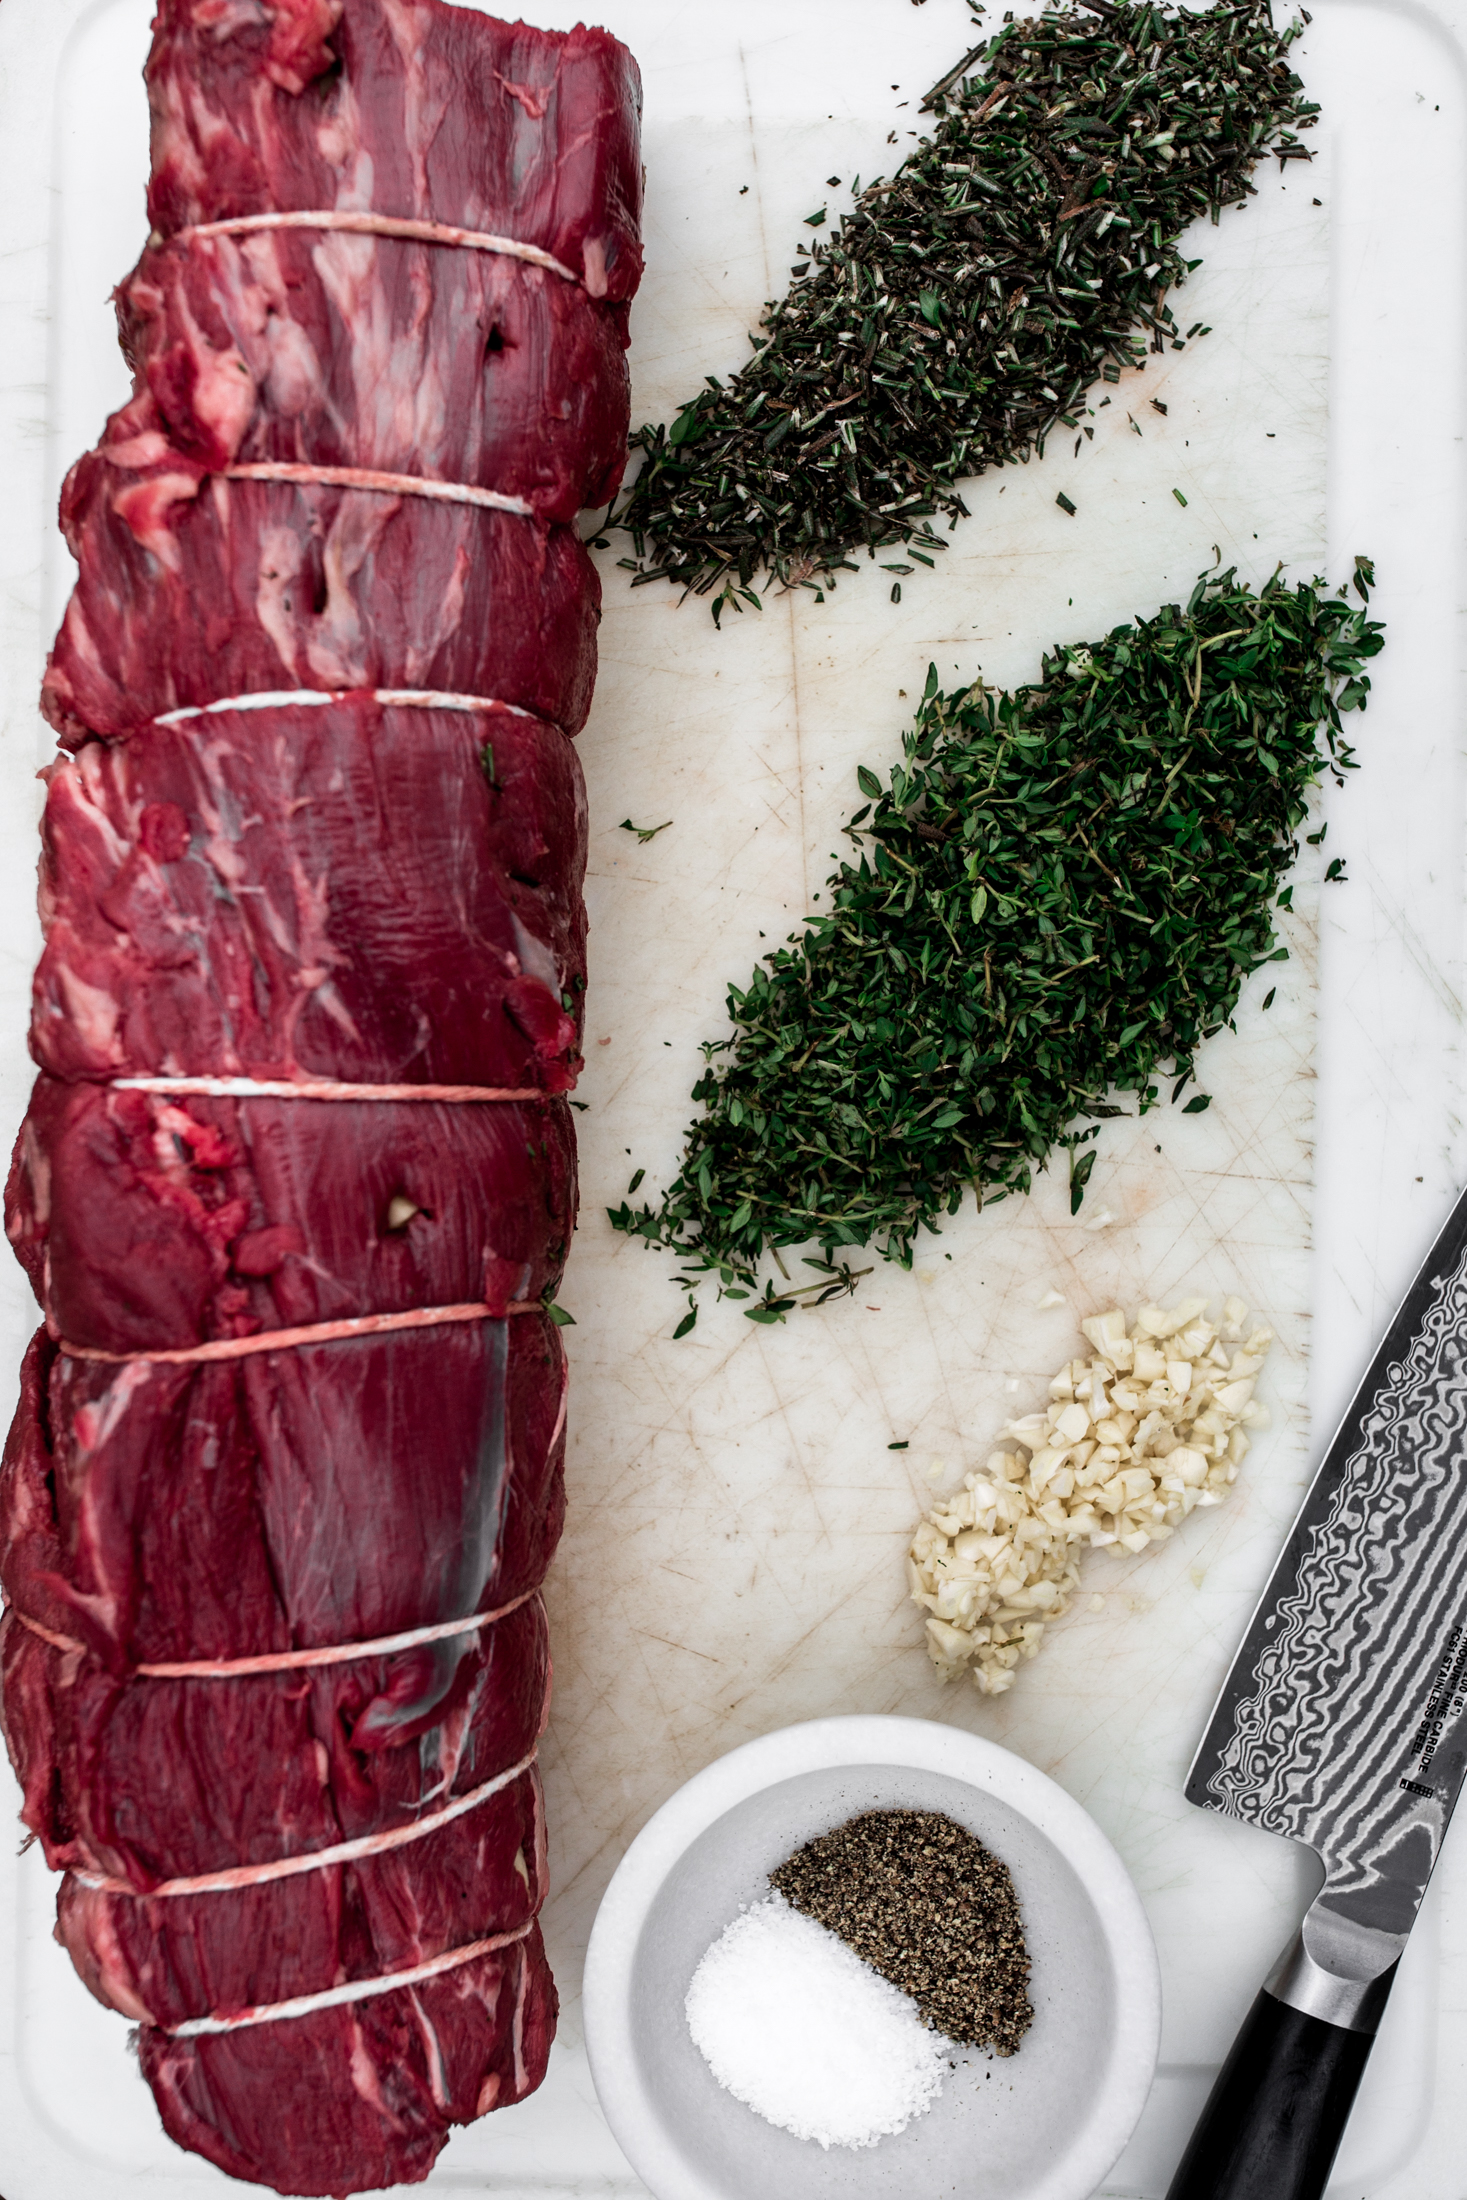 Herb Roast Beef Tenderloin recipe from cooking with cocktail rings ingredients